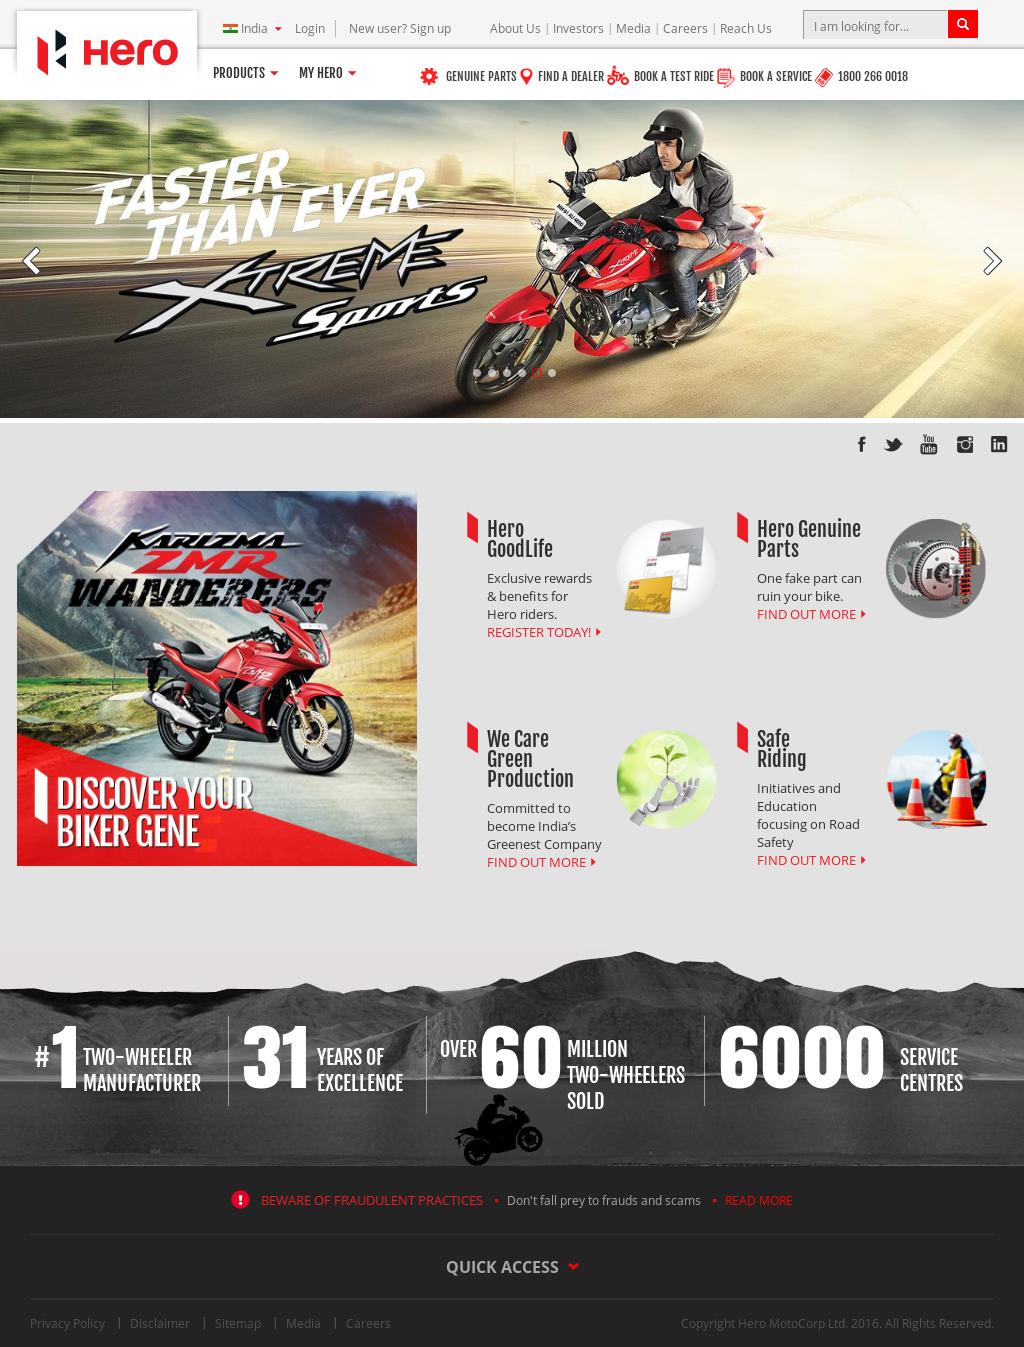 Hero MotoCorp Competitors, Revenue and Employees - Owler